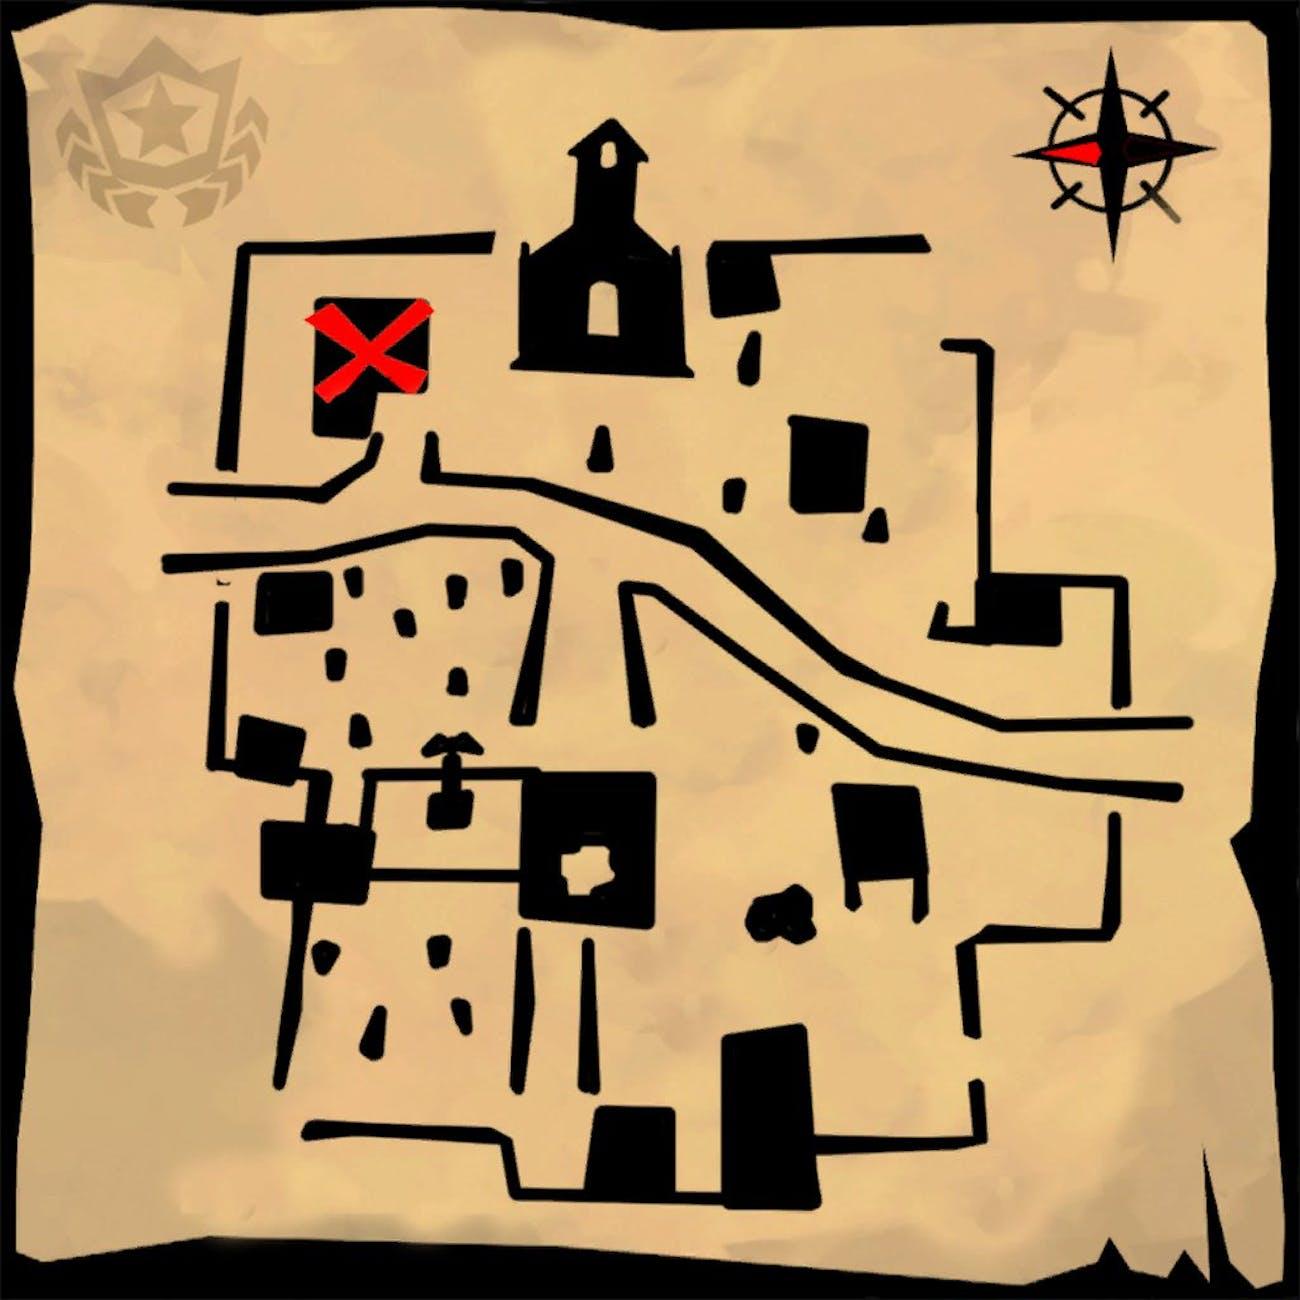 'Fortnite' Week 5 Challenge Treasure Map